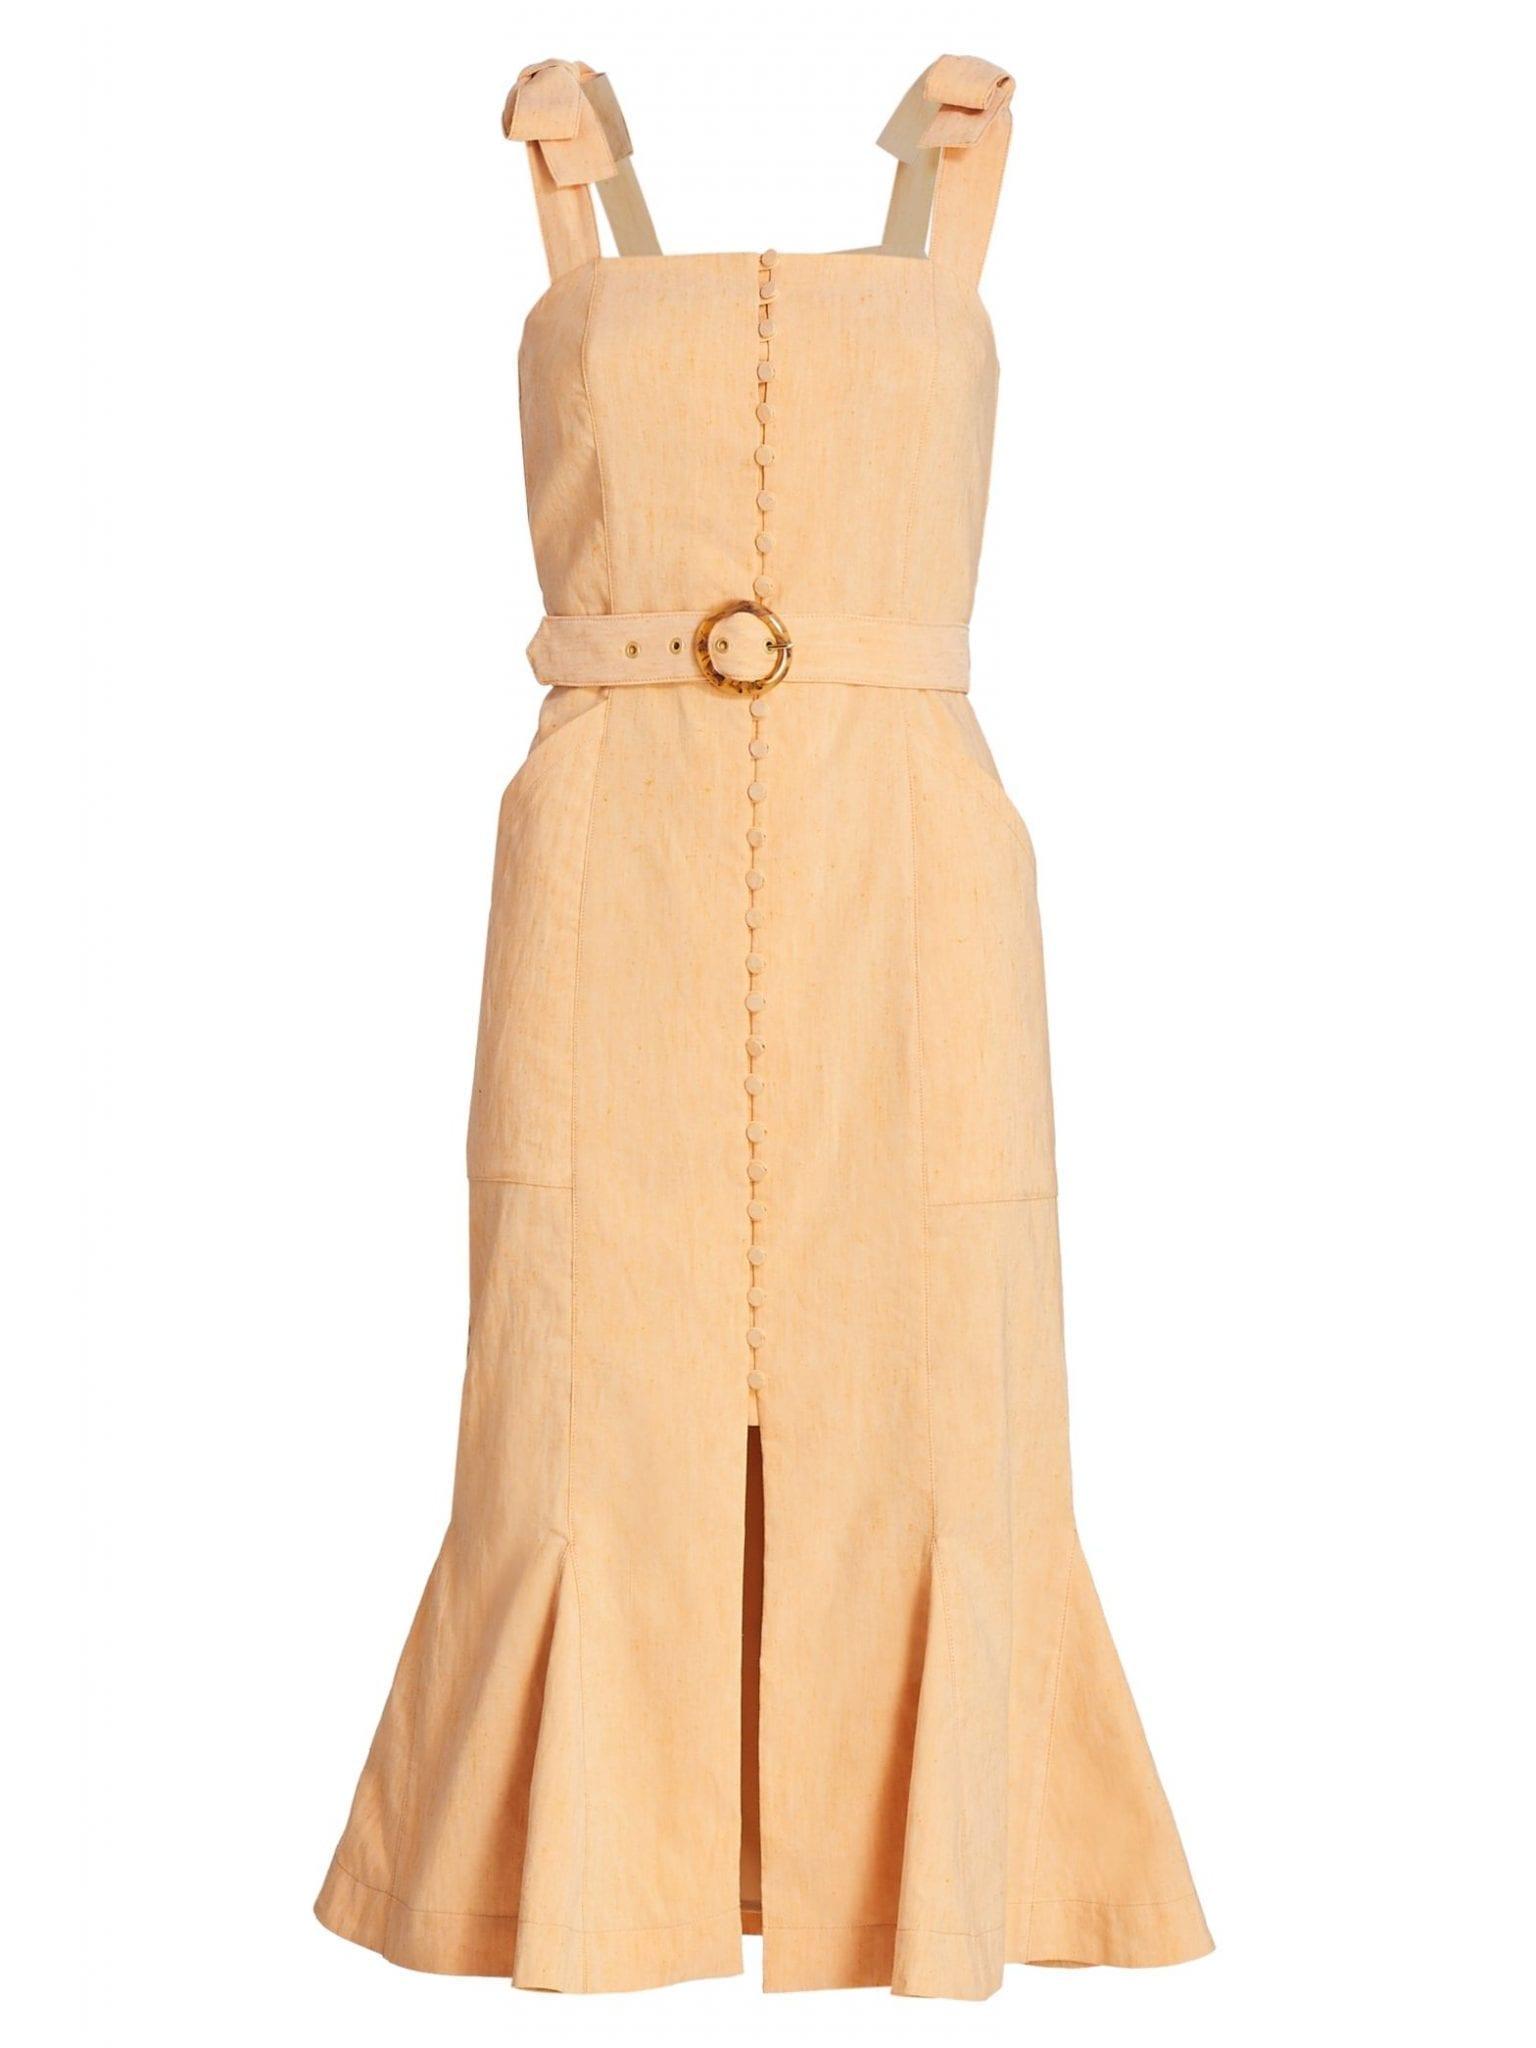 JONATHAN SIMKHAI Dawn Tie-Strap Belted Apron Flare Dress